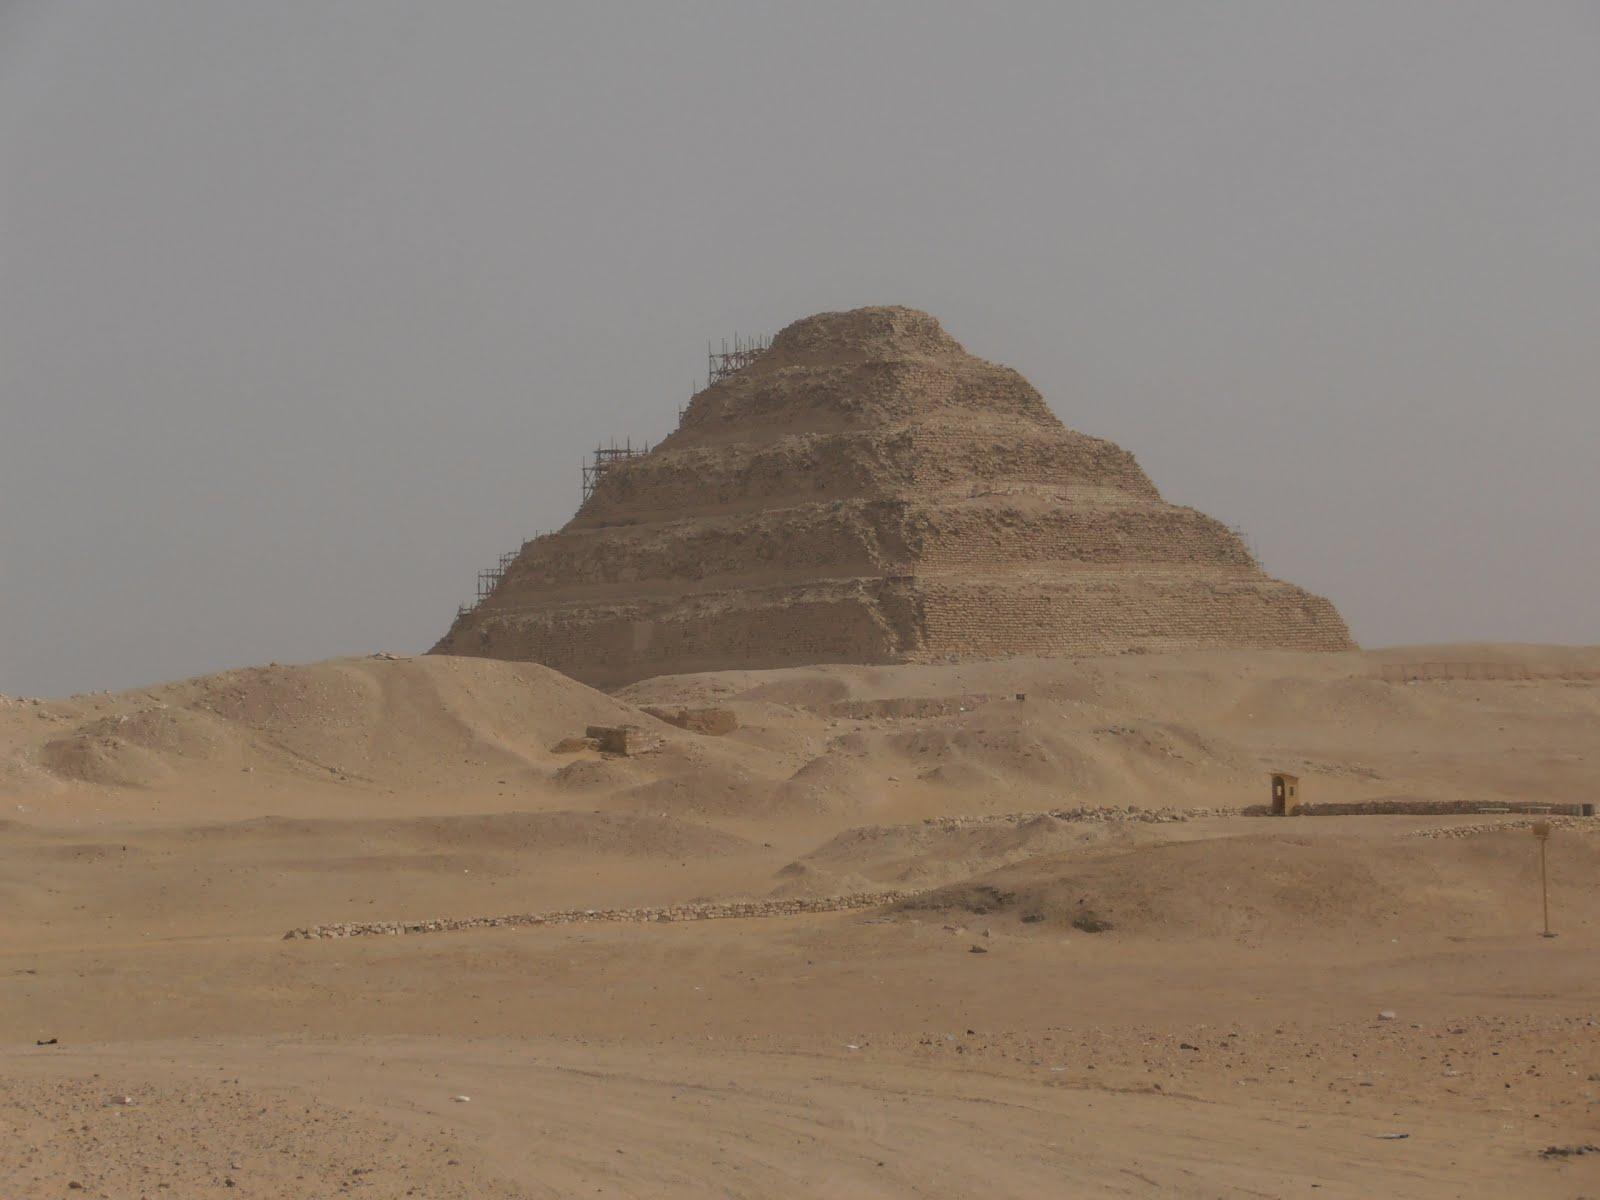 Lost in London: Cairo: a visita às Pirâmides requer precaução em  #7D654E 1600 1200